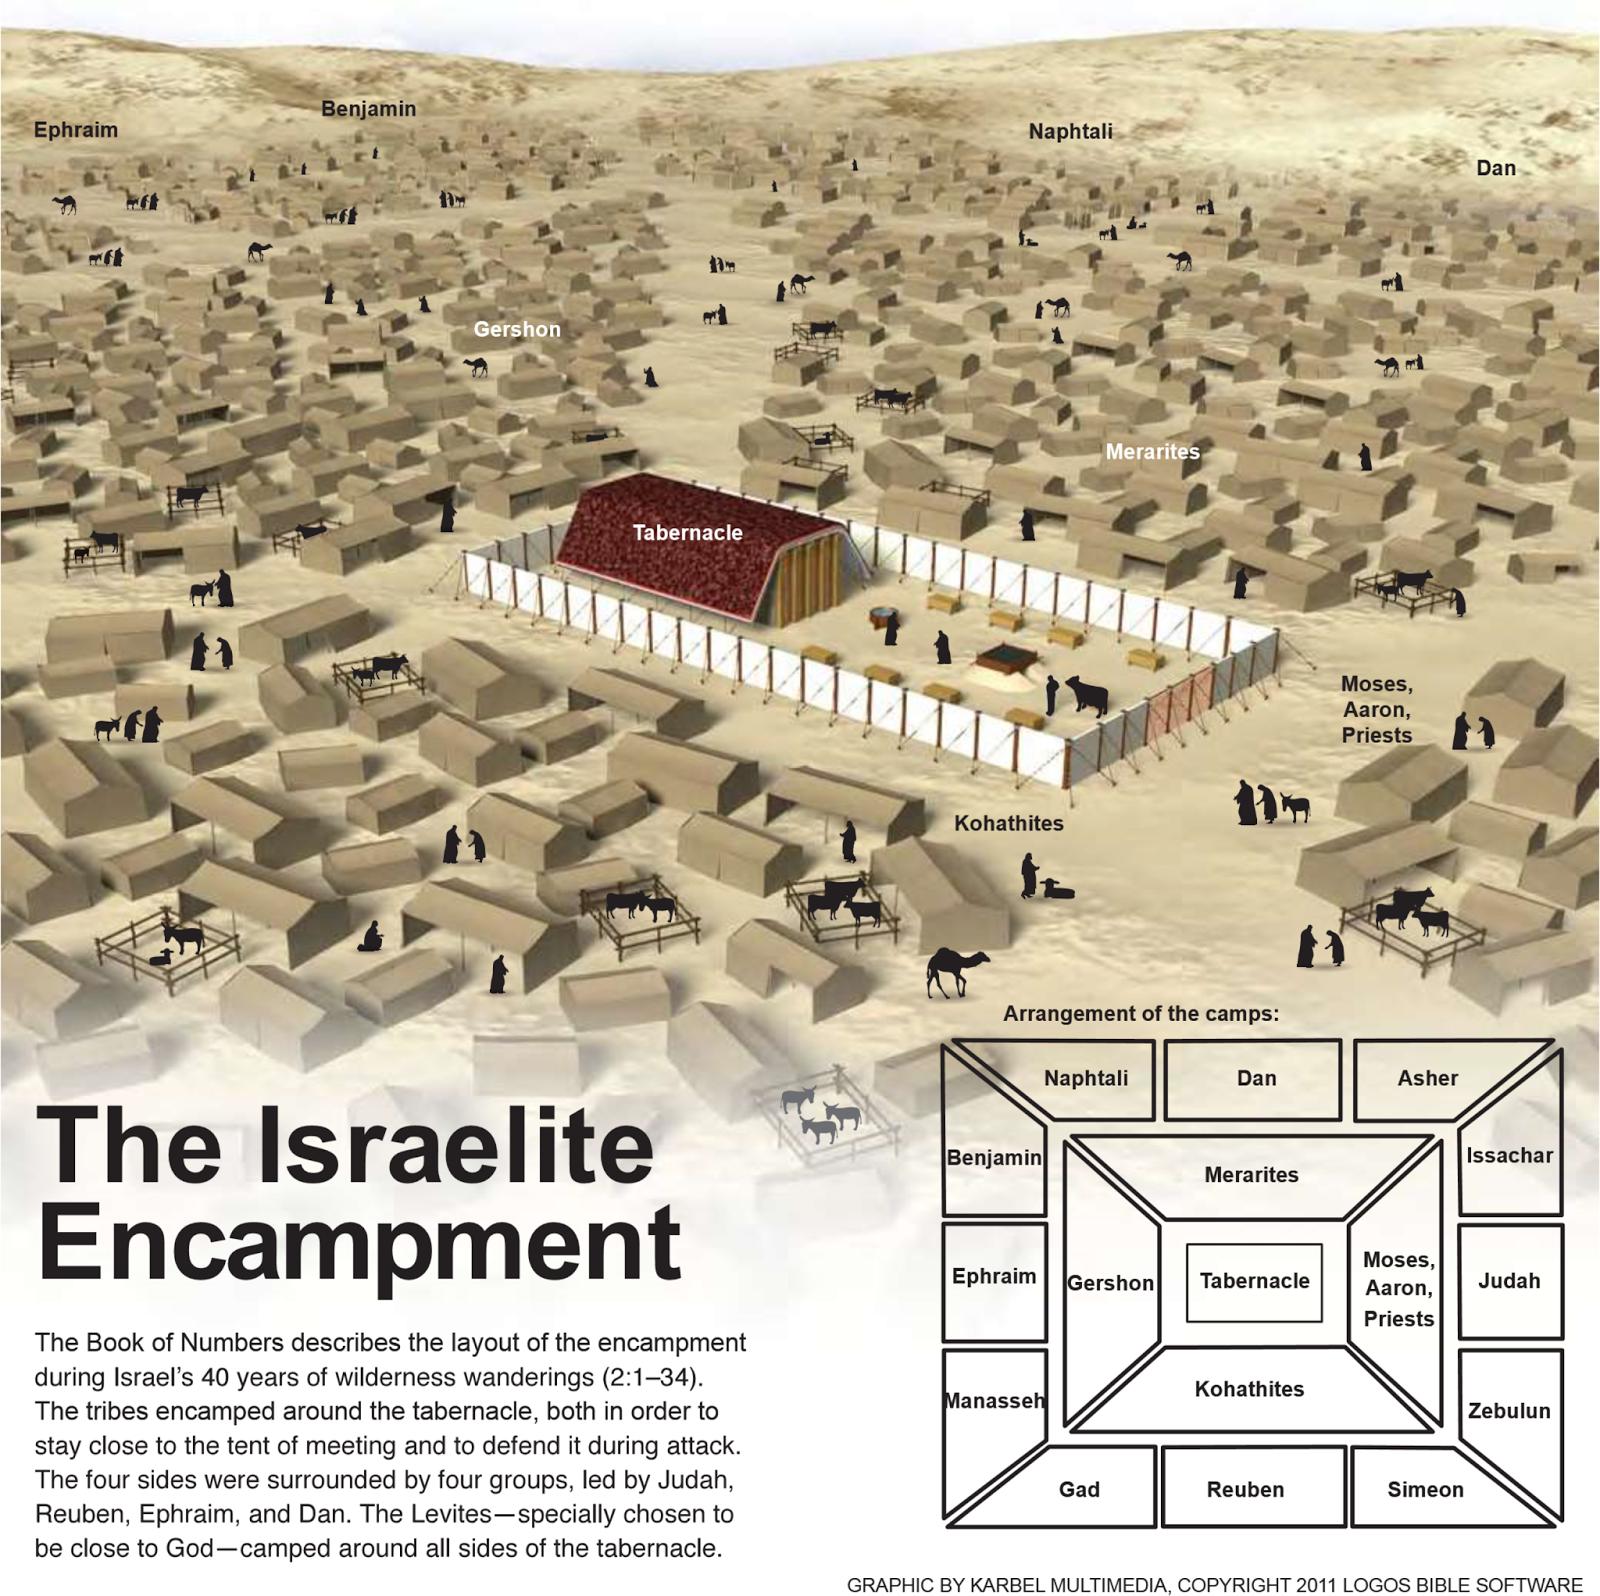 https://pastorbillington.files.wordpress.com/2021/02/7040f-the2bisraelite2bencampment.png